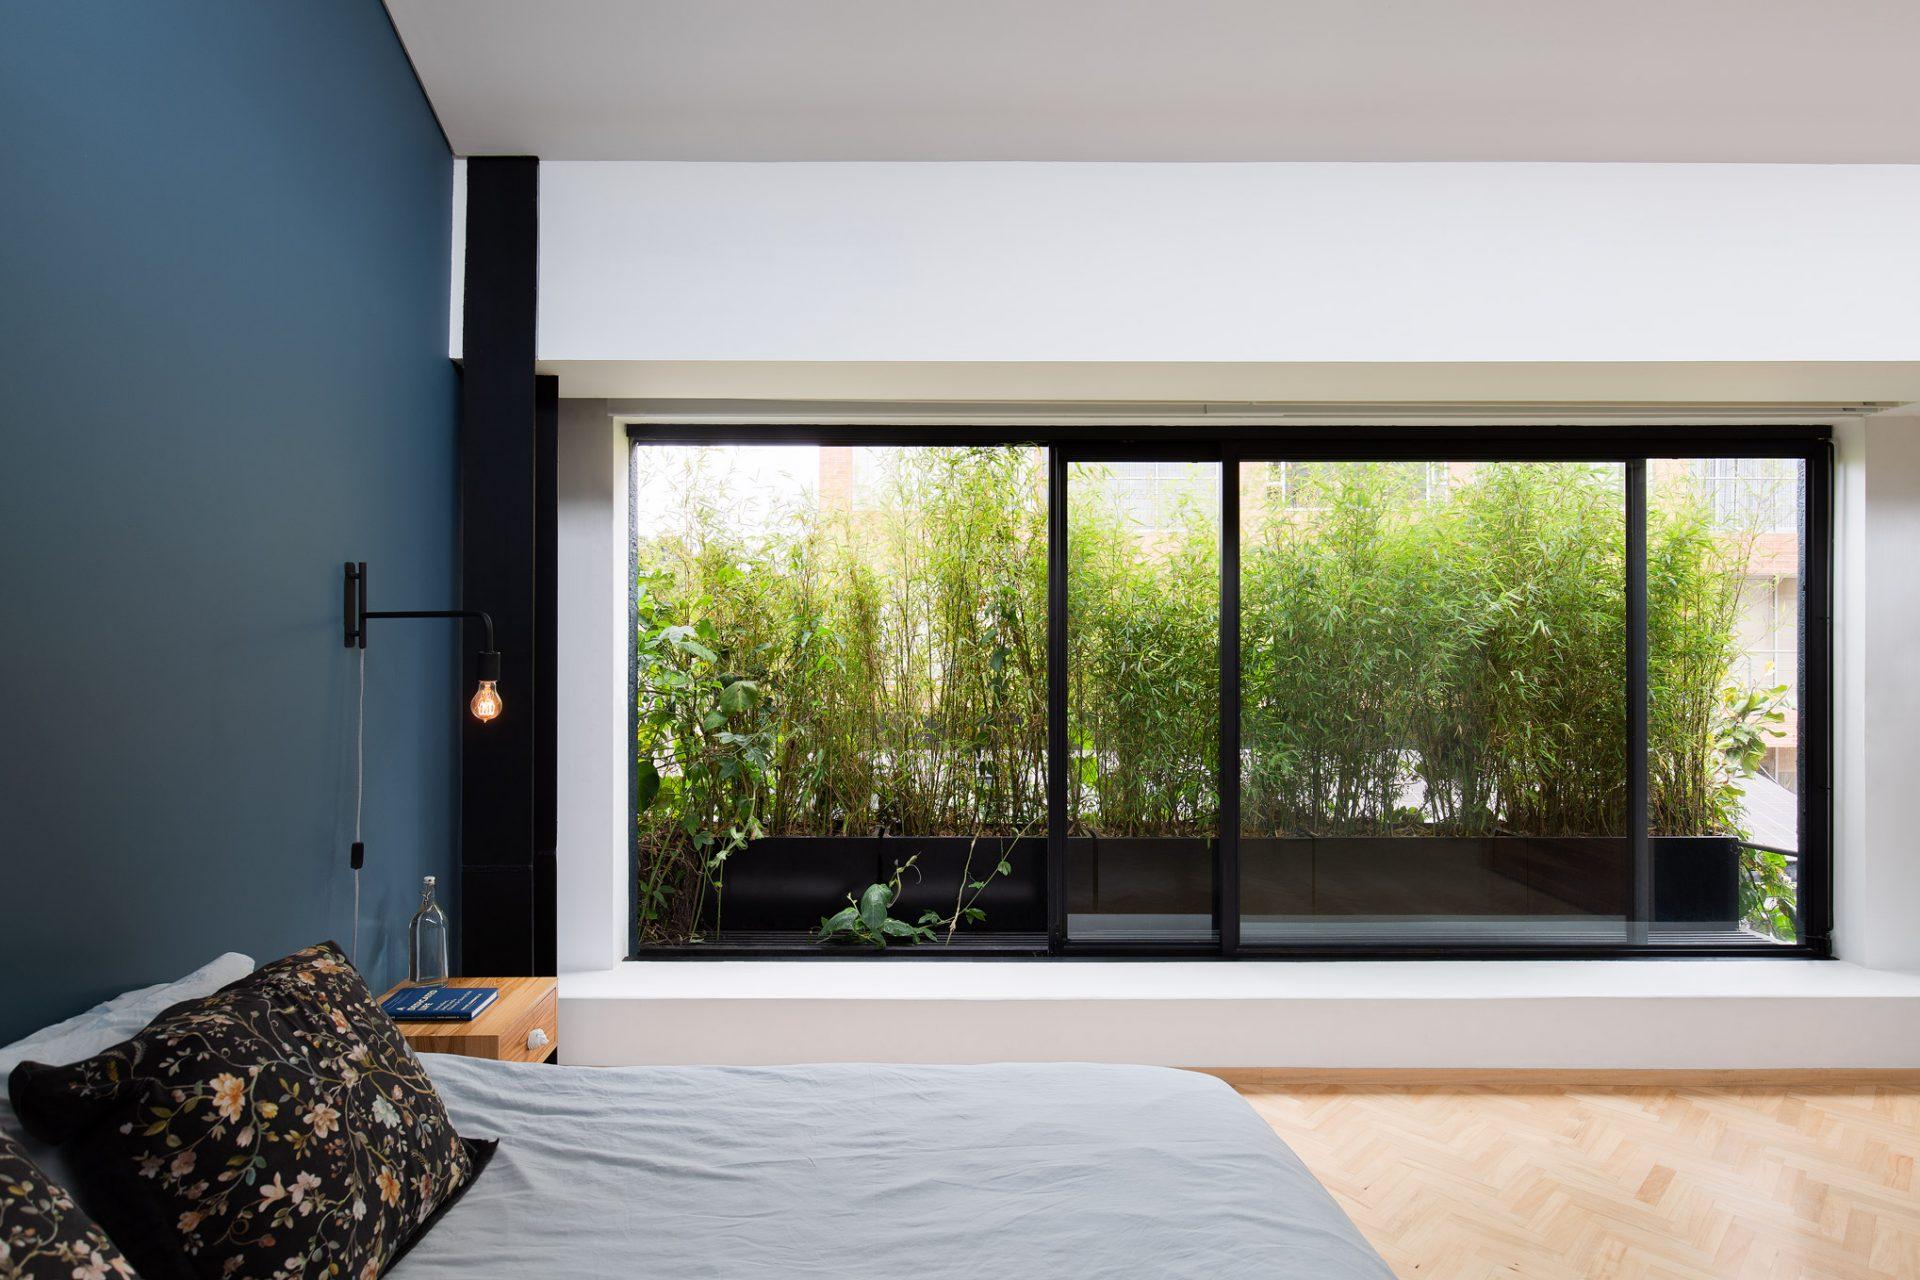 02.oberlaenderarquitectos.arquitectura.simonboschphotography.simon.bosch.bogota.interior.habitar